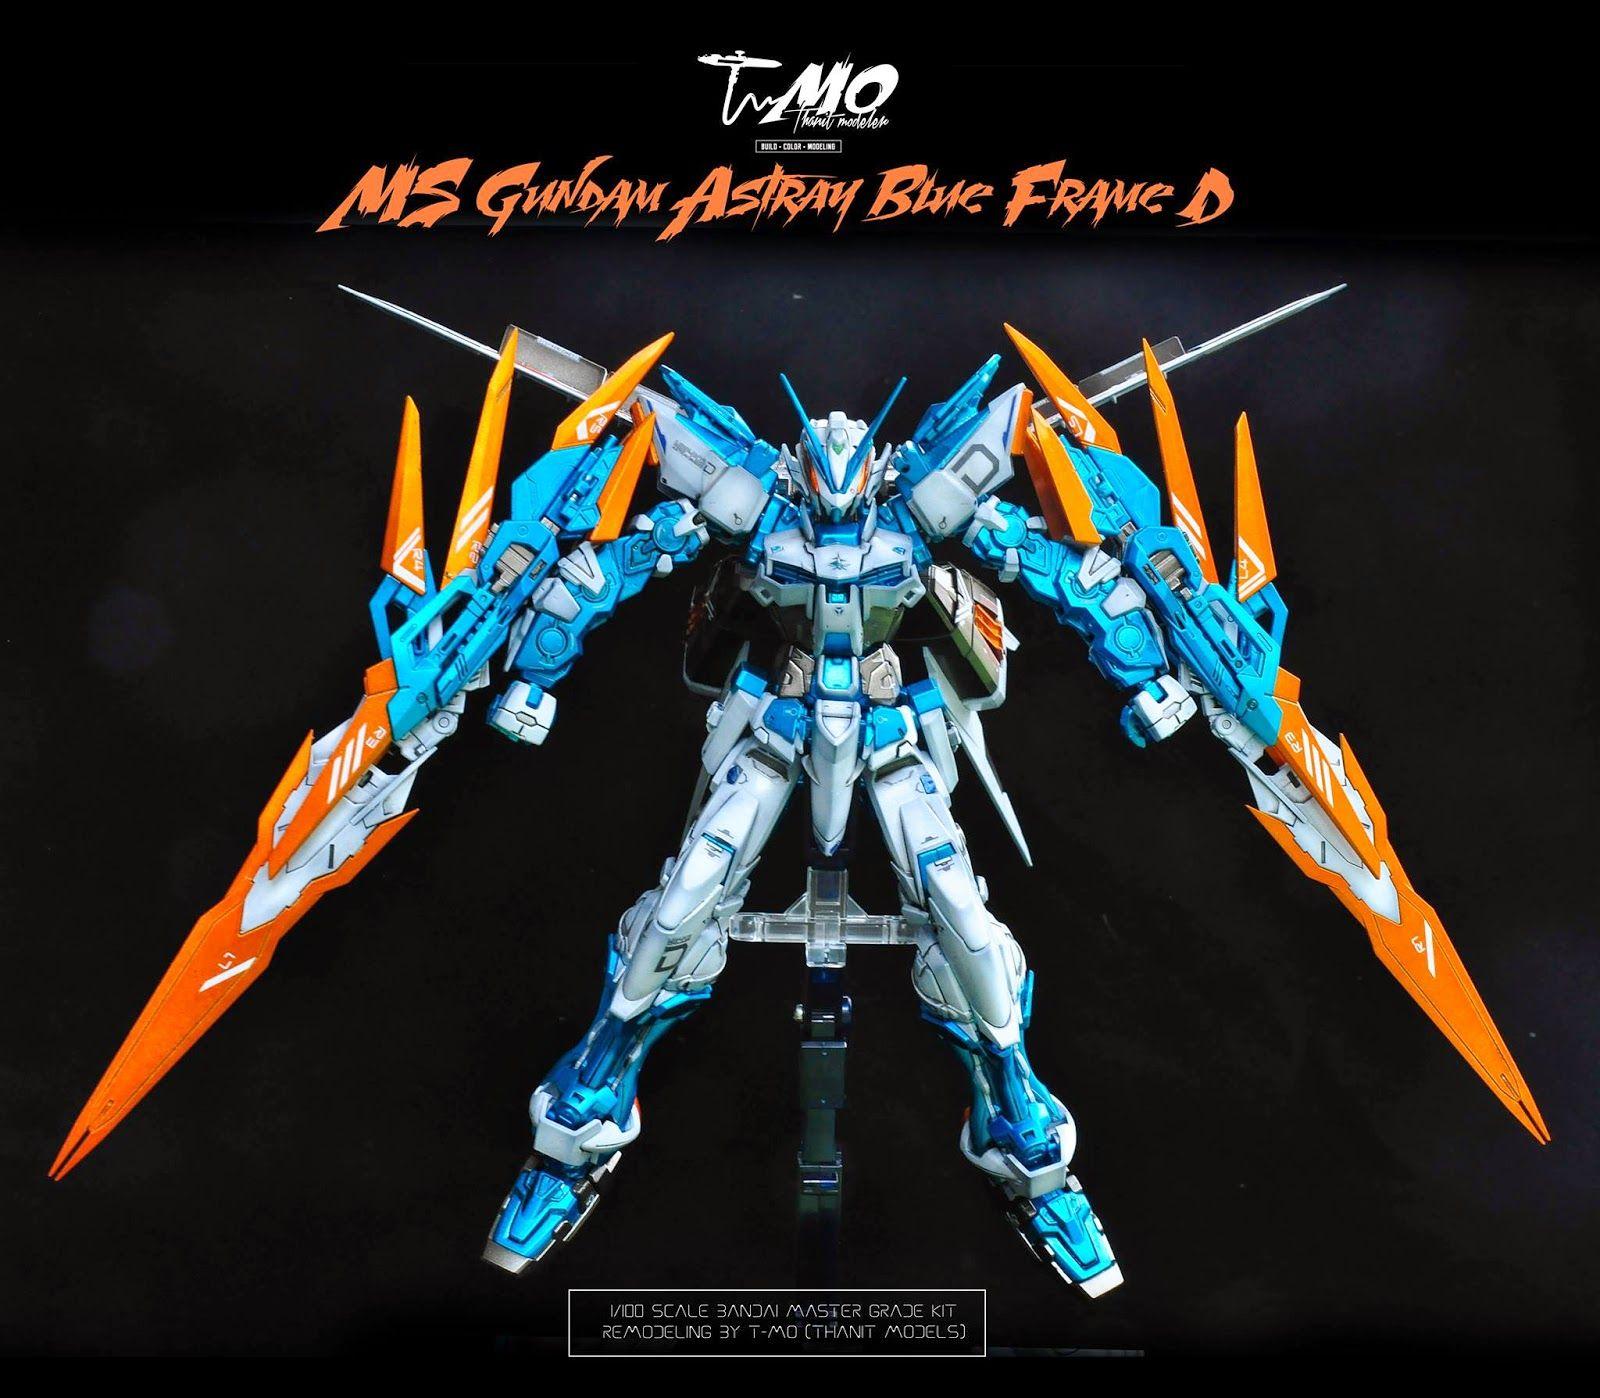 GUNDAM GUY: GUNDAM GUY: READERS FEATURE GUNPLA BUILD - MG 1/100 Gundam Astray Blue Frame D by T-MO